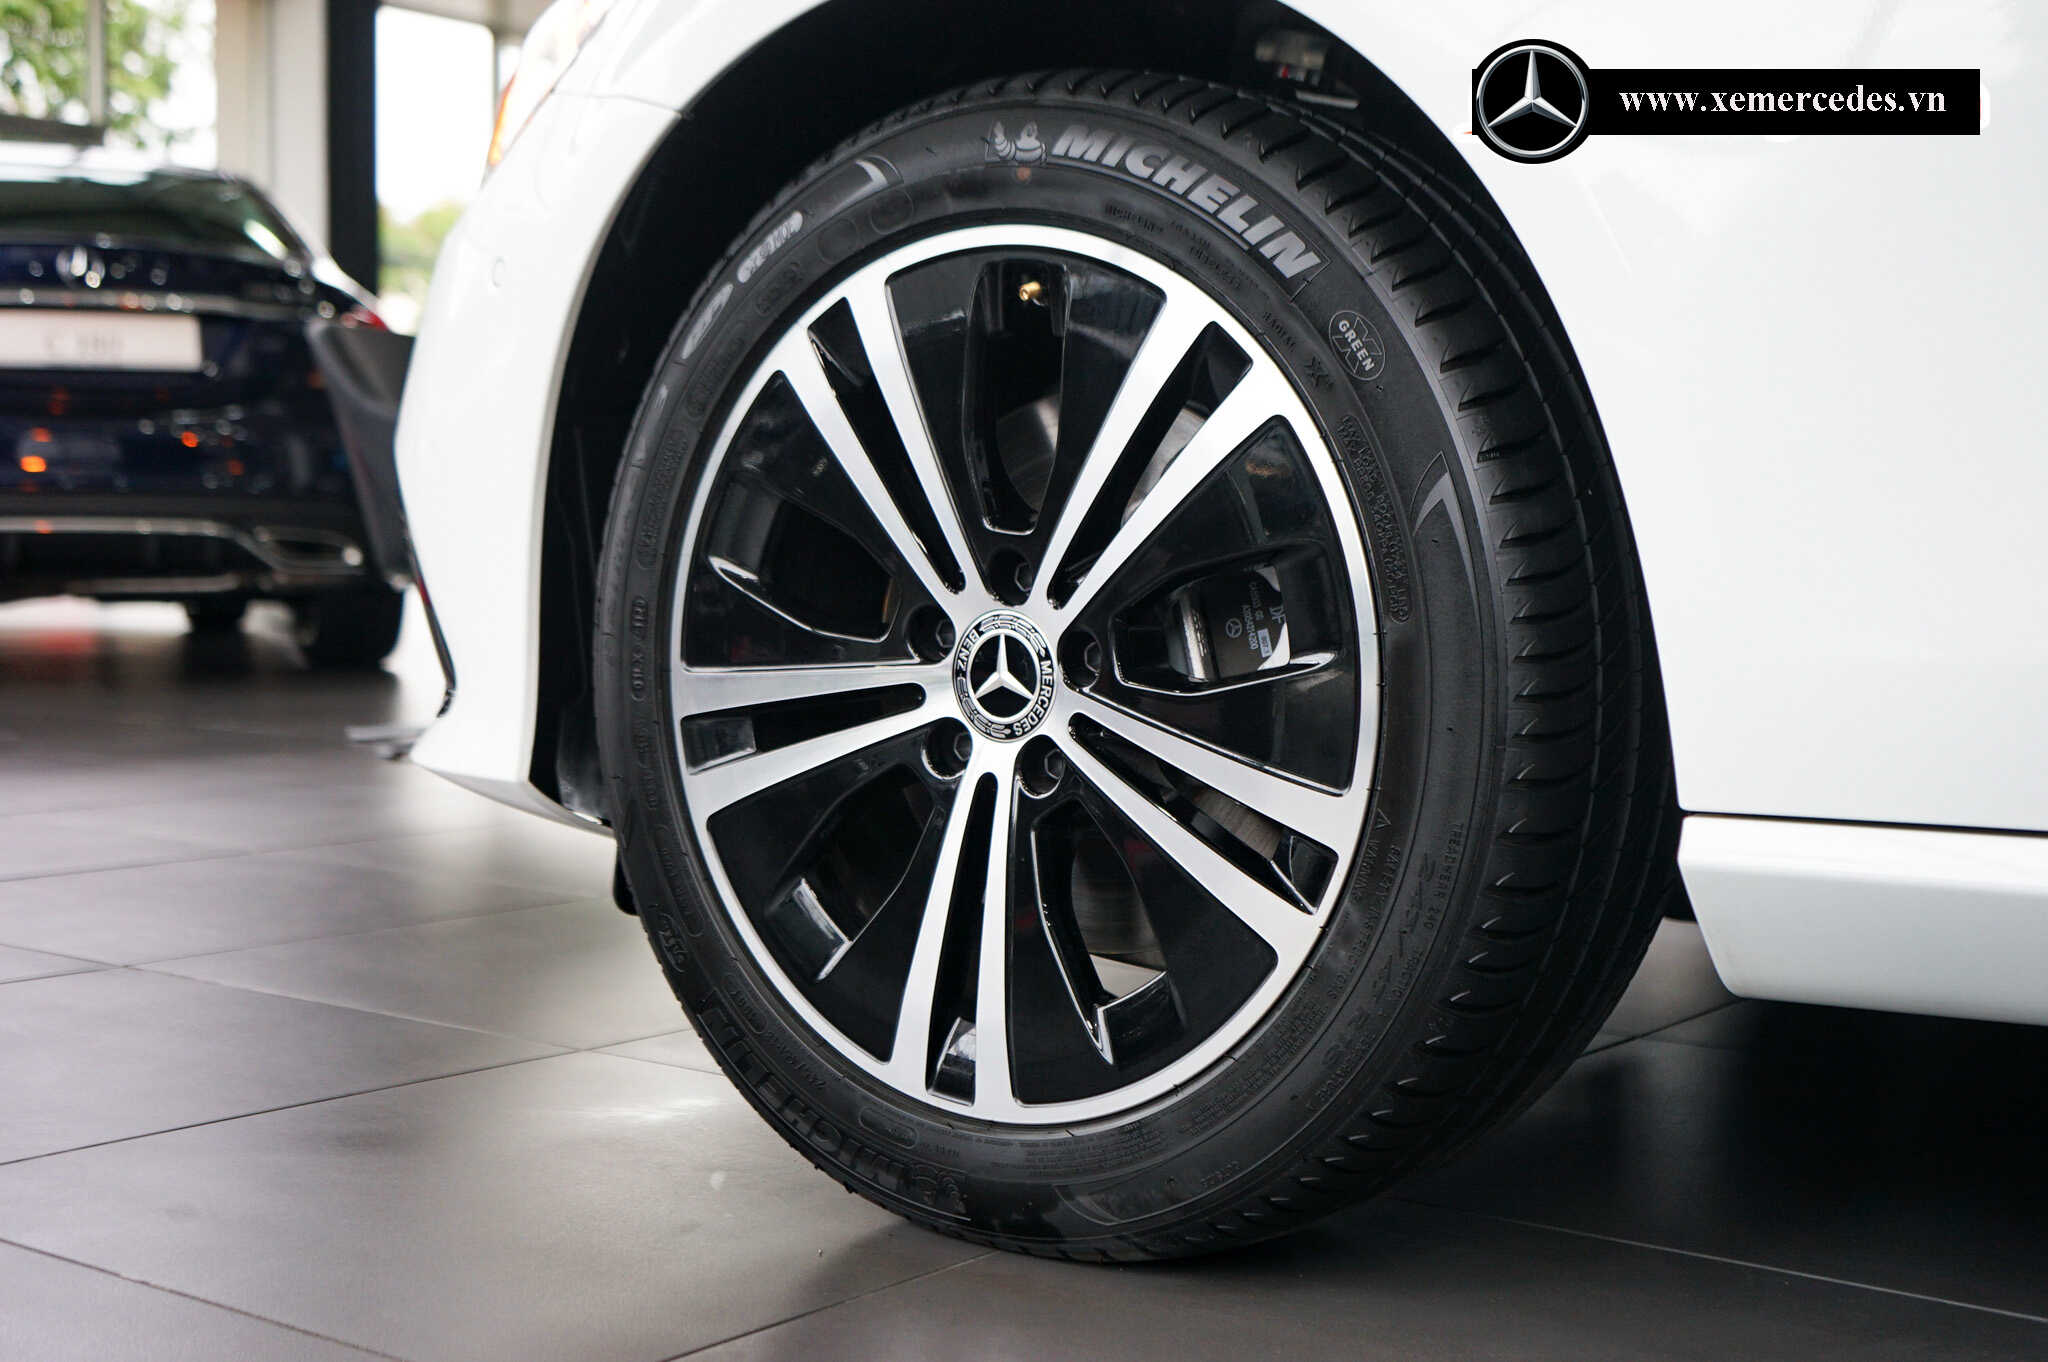 Mercedes E180 2022 Mercedes Vietnam (1)